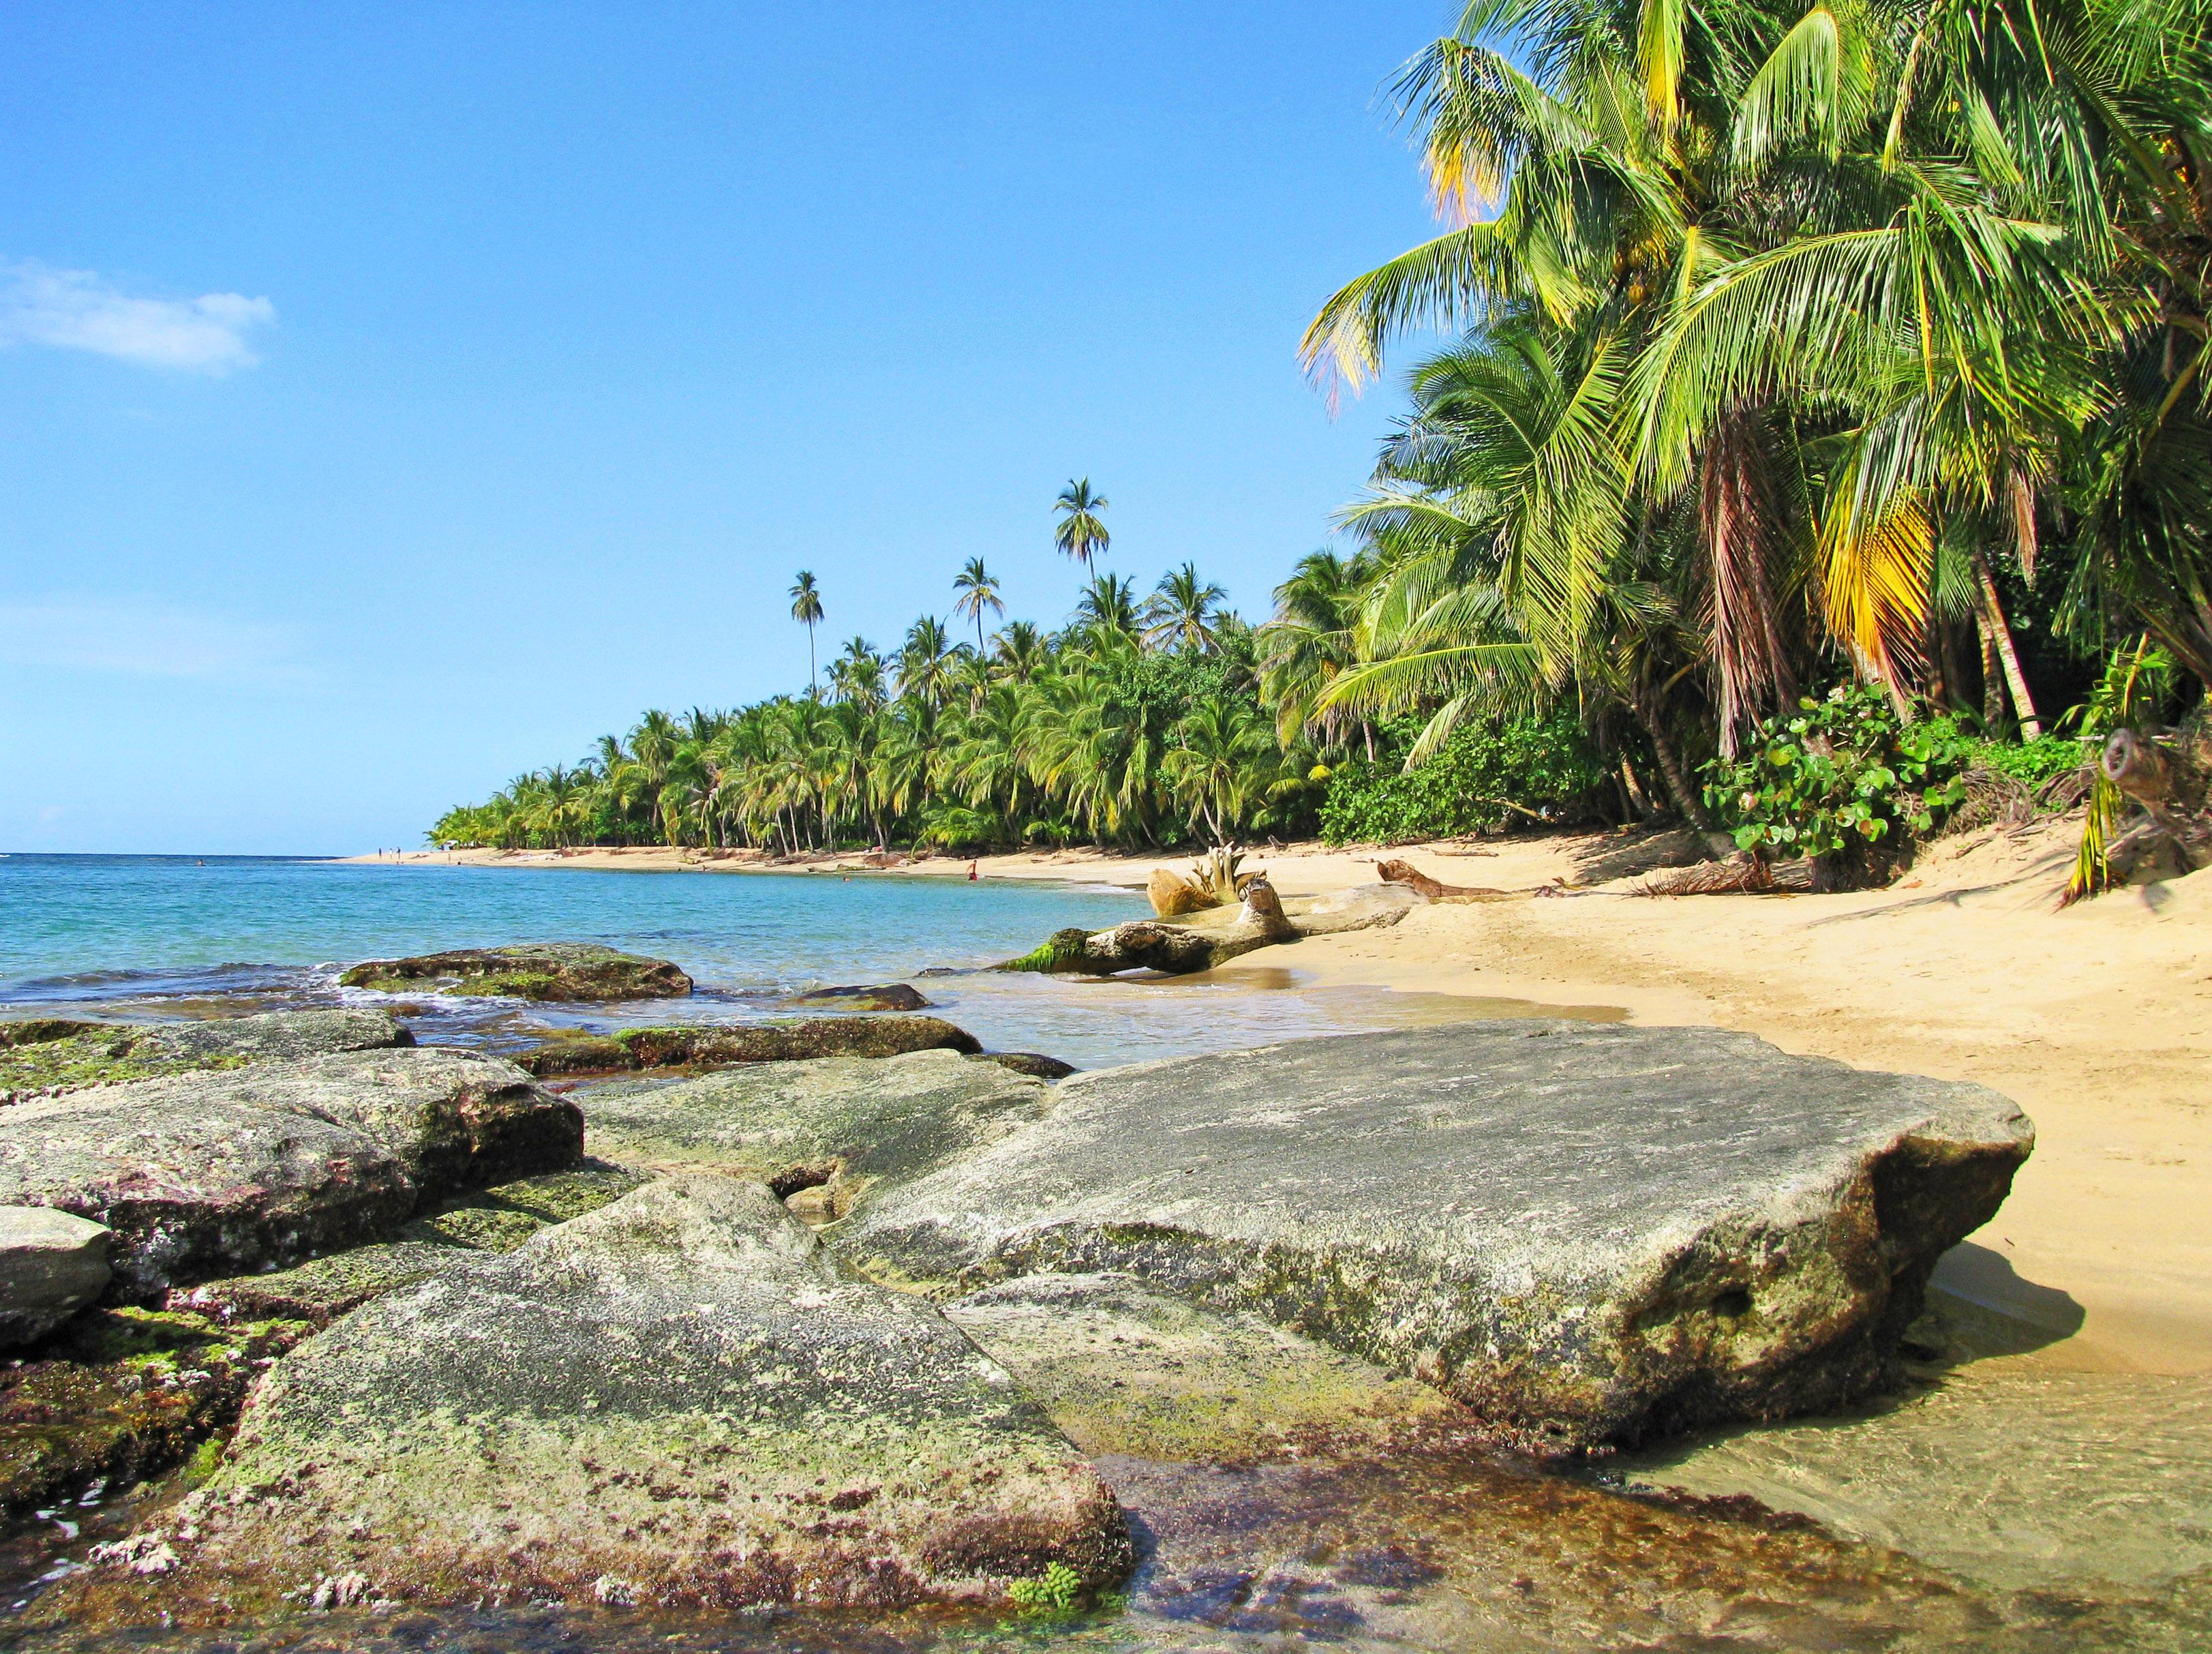 Extrêmement Punta Uva, Limon - Costa Rica Beaches - Reviews, Weather report  AY29